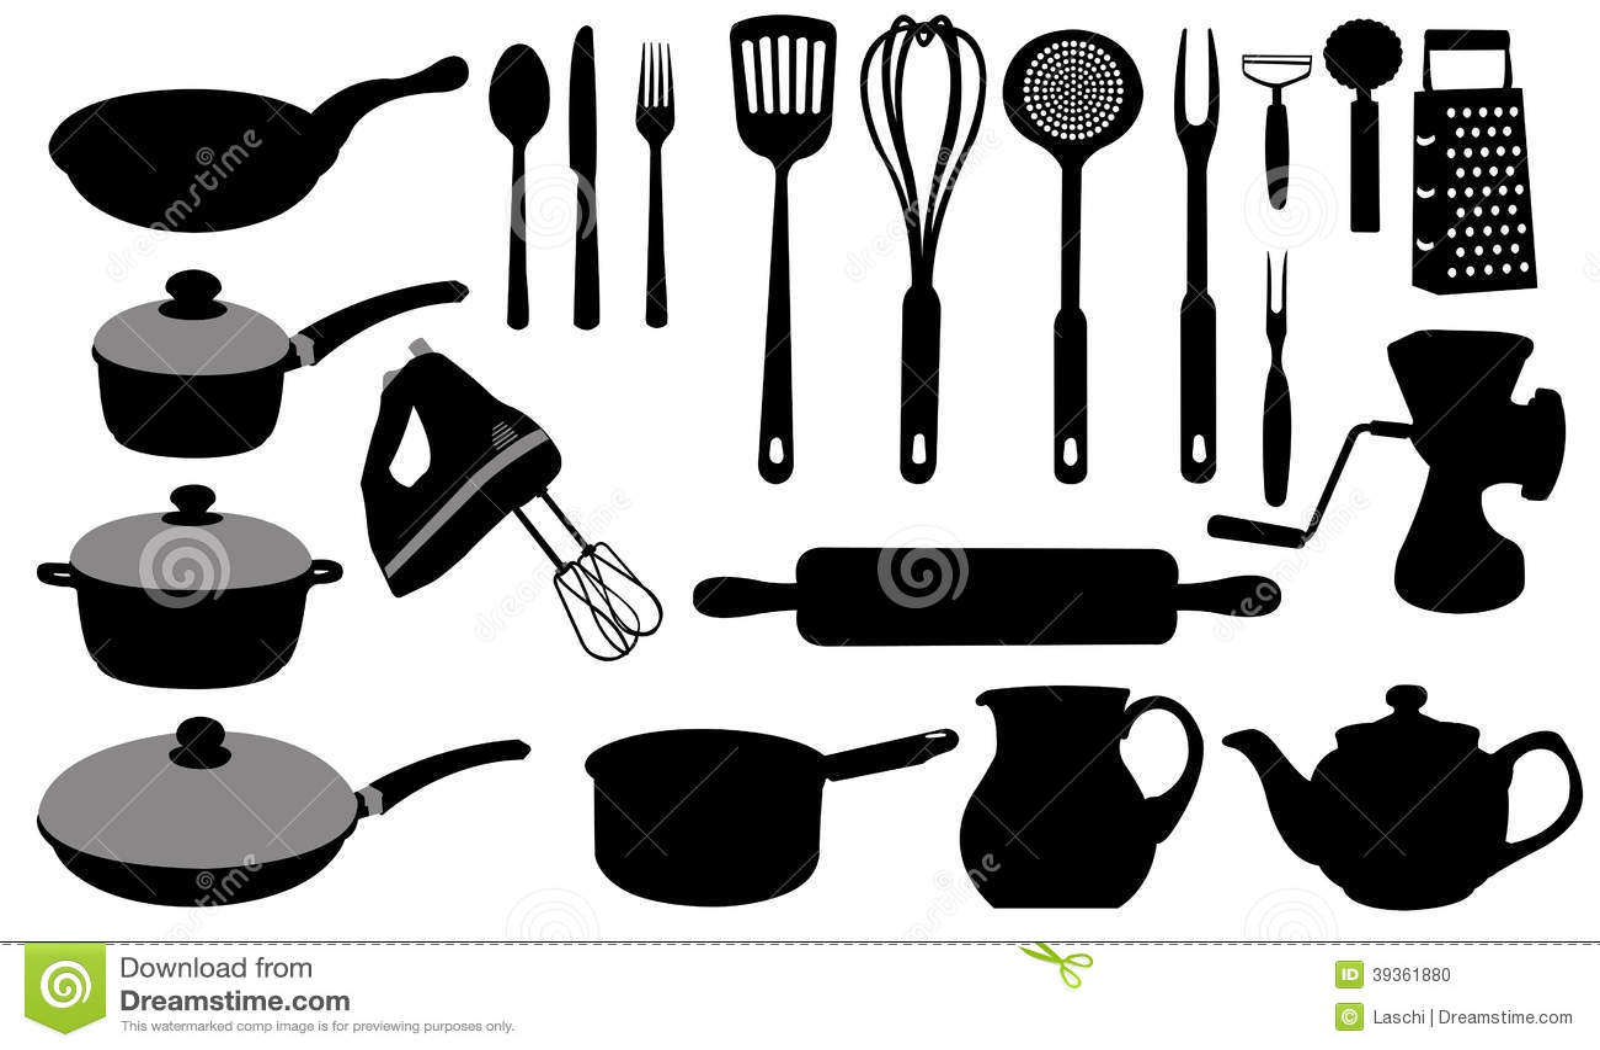 Kitchen Equipment Clip Art ~ Kitchen tools stock vector image